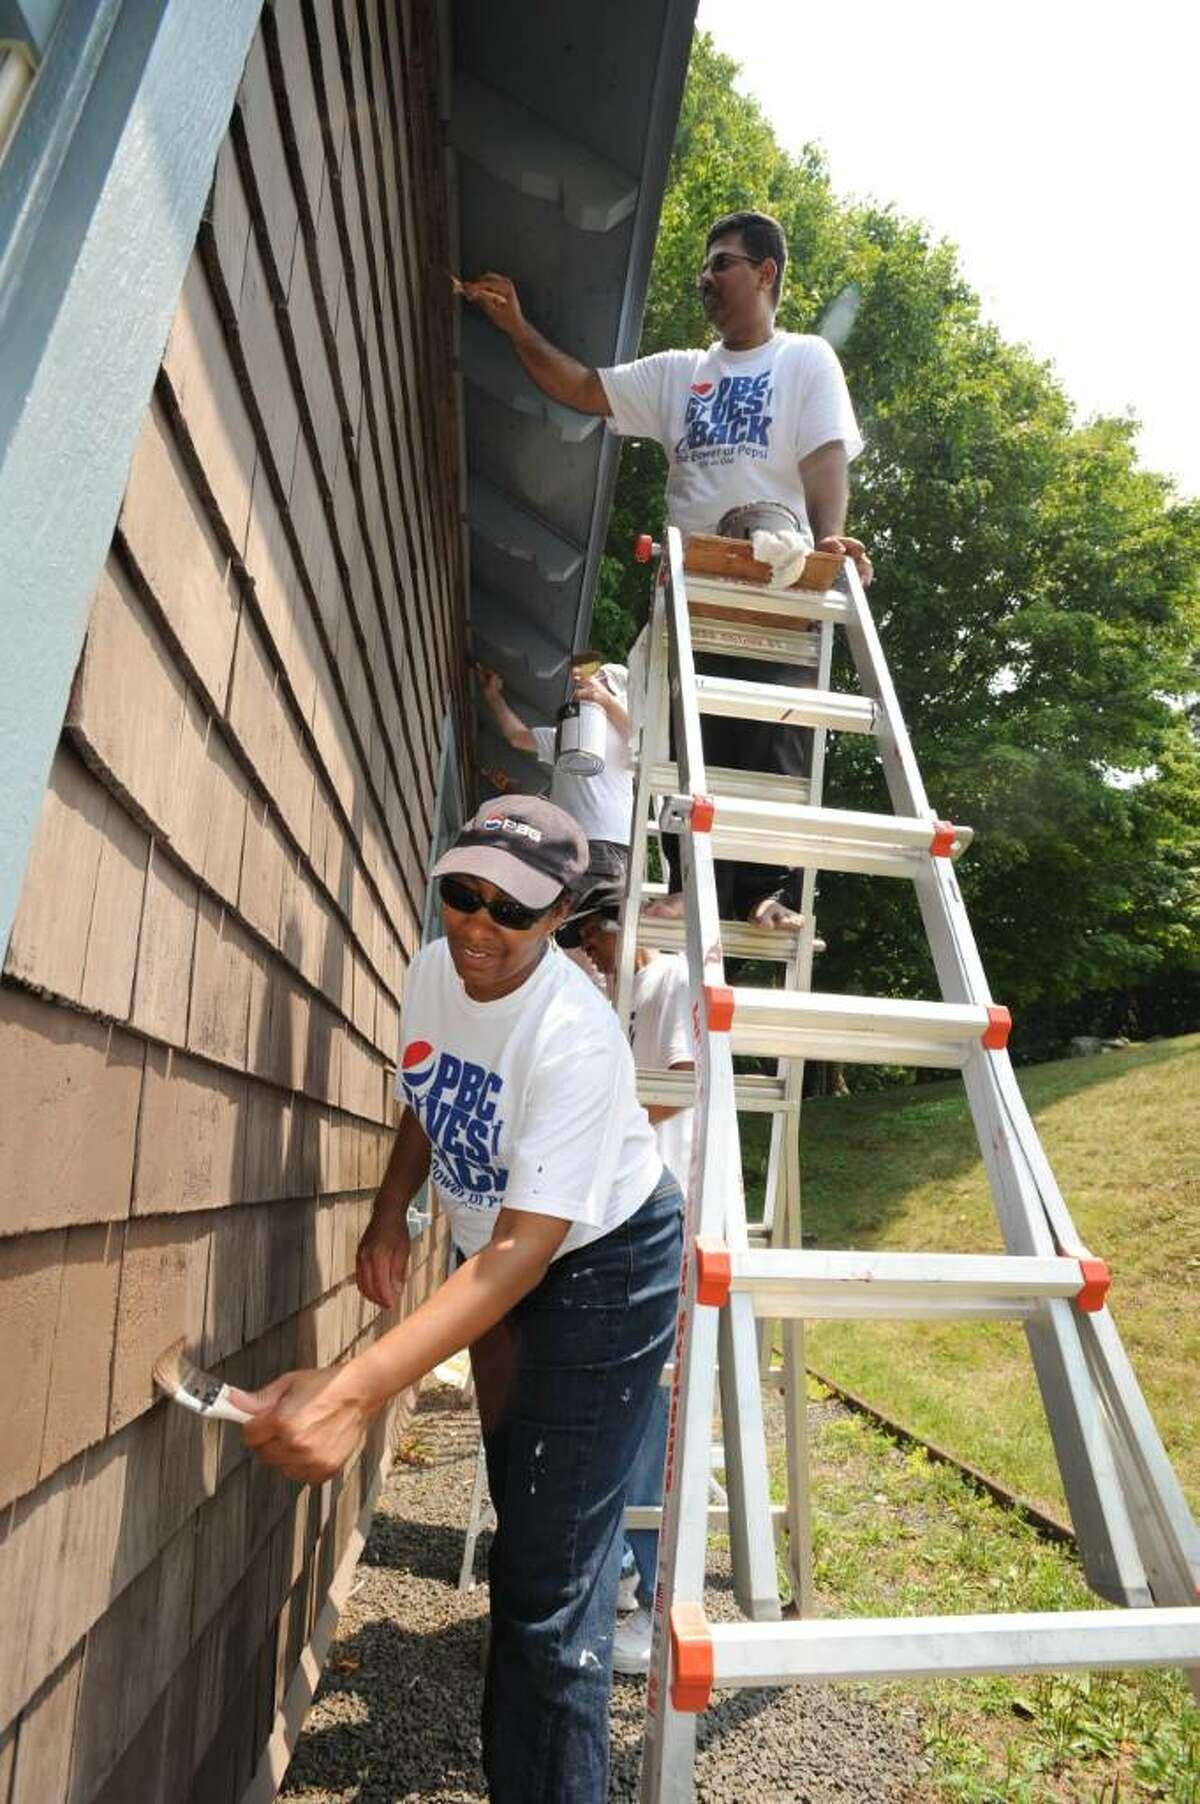 Pepsi volunteers Kenita Hickman-Johnson, left, and Vijay Rao paint at the Tarrywile Park Authority.